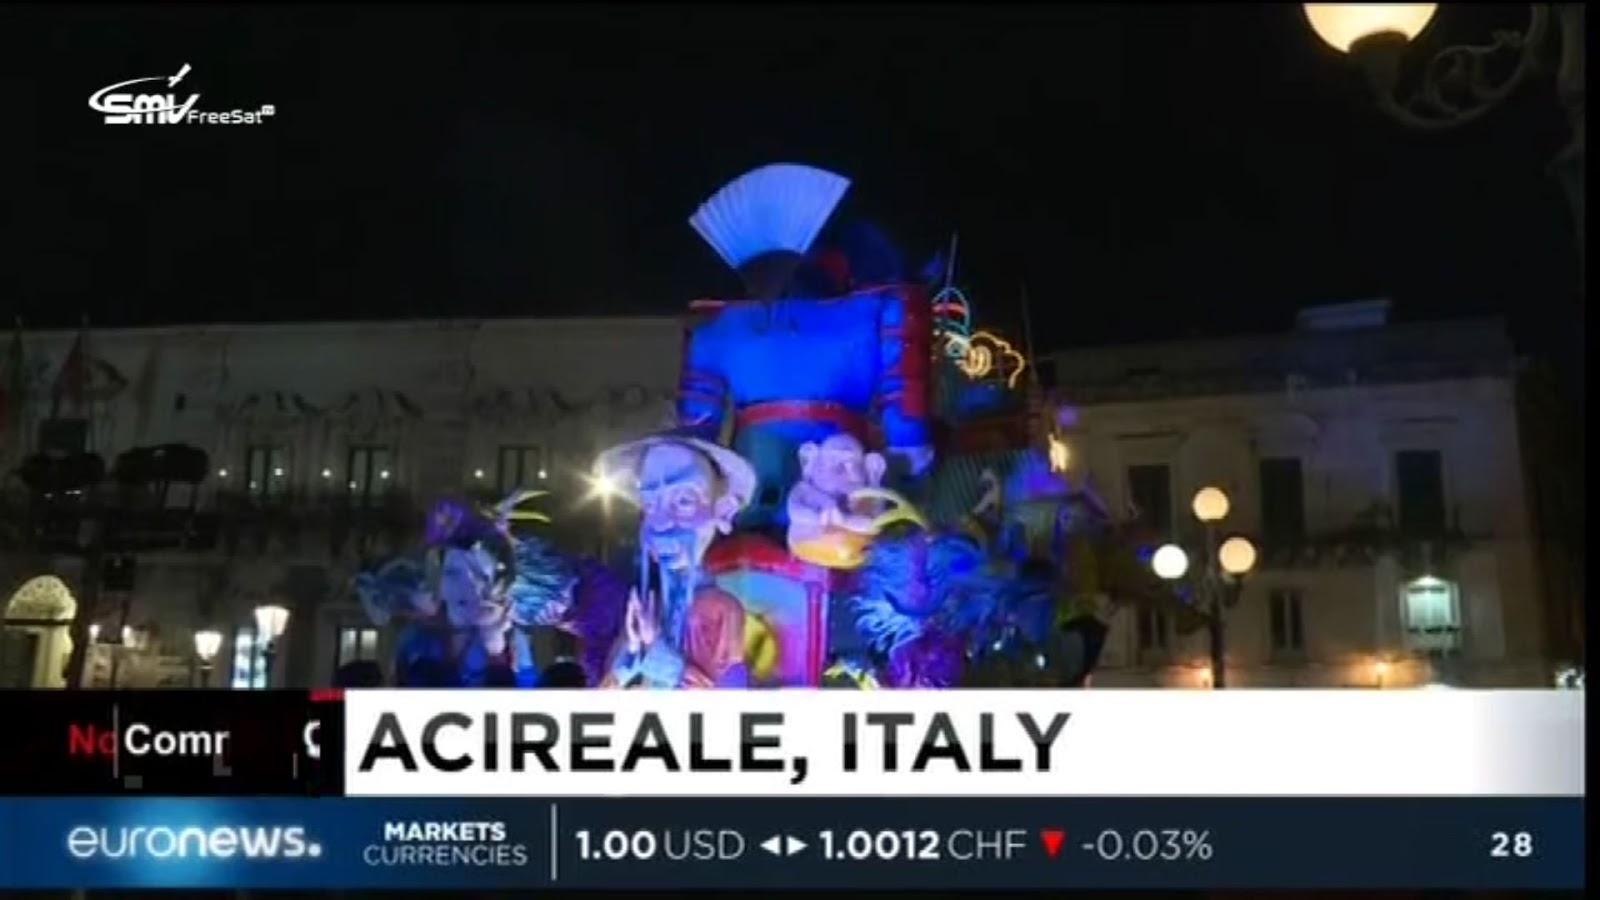 Frekuensi siaran Euronews Channel di satelit ABS 2A Terbaru